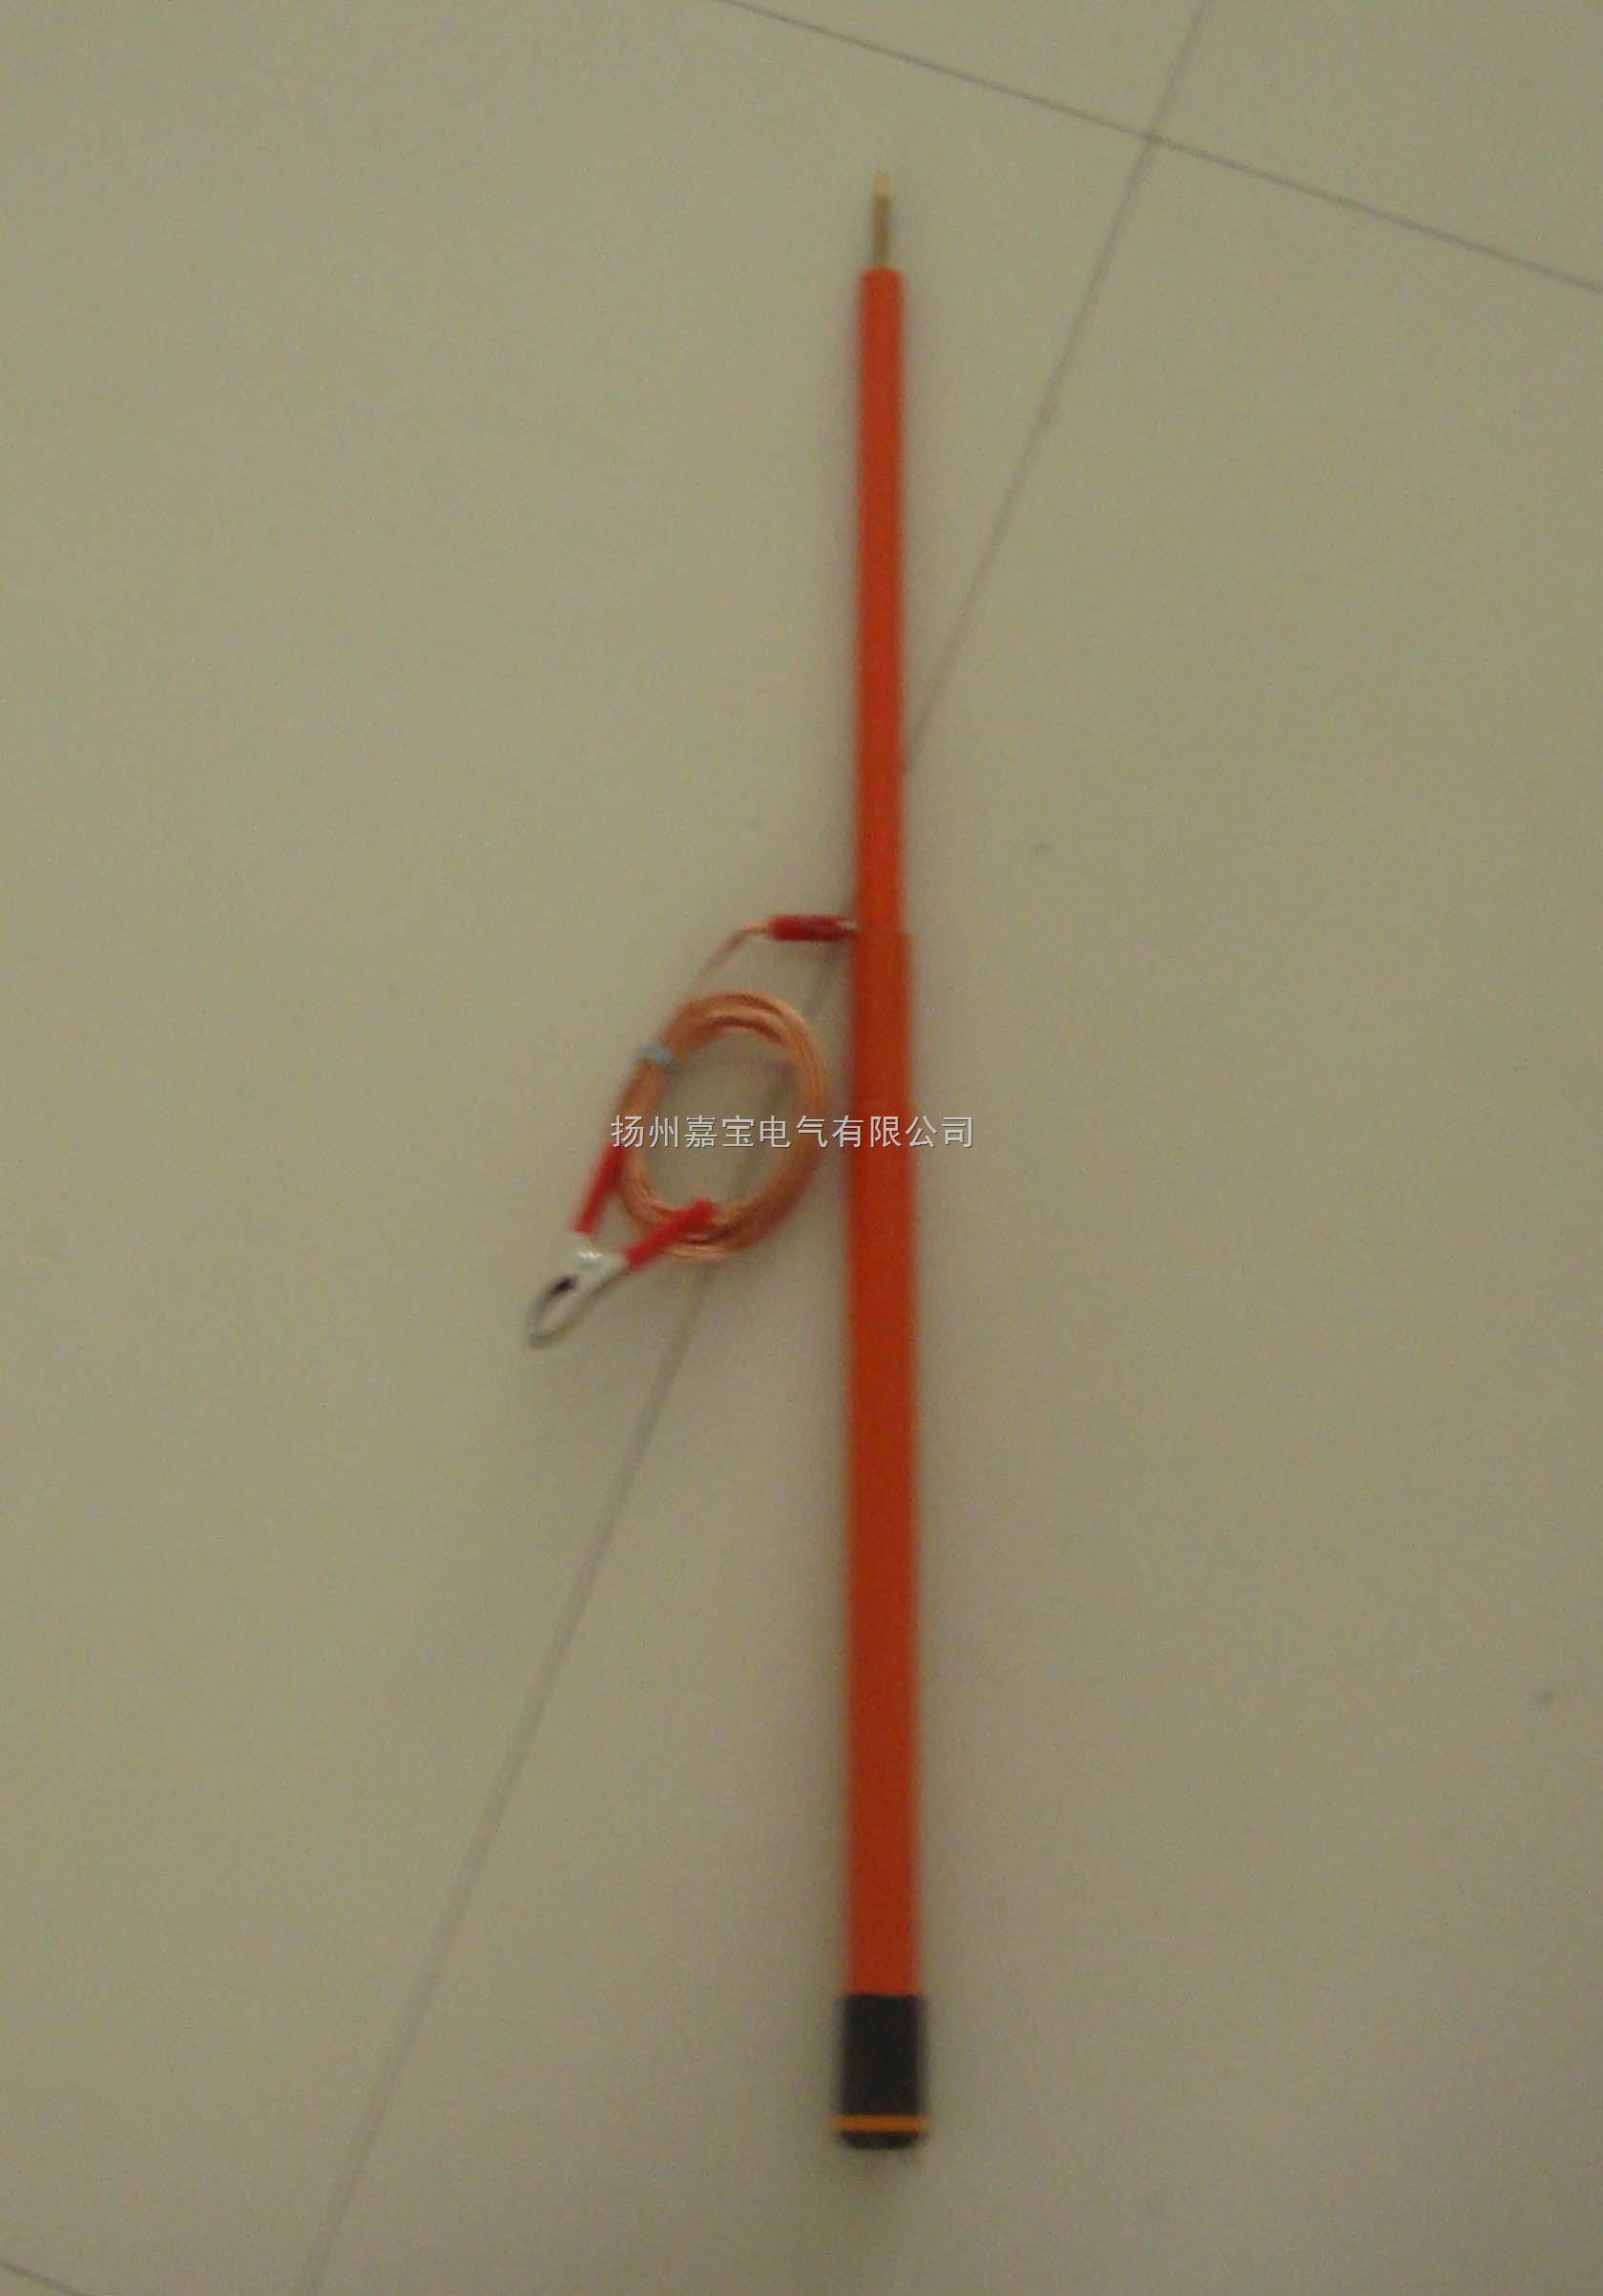 220v电棒内部接线图